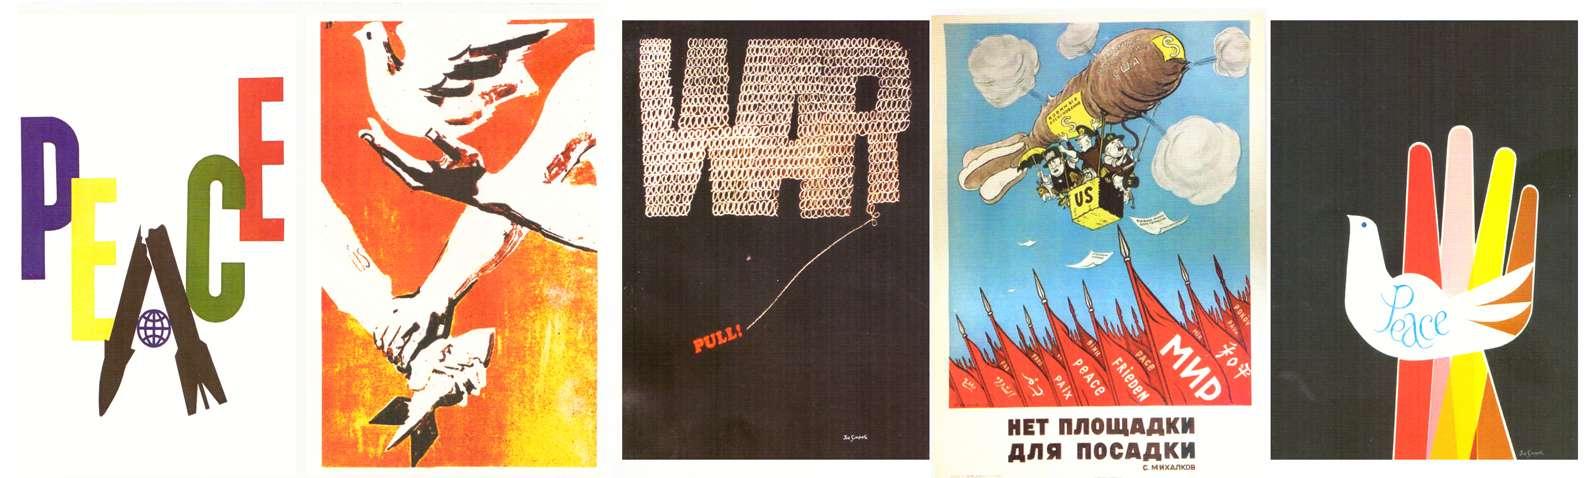 slide Κόκκινο Αερόστατο ειρήνη 15 αφίσες